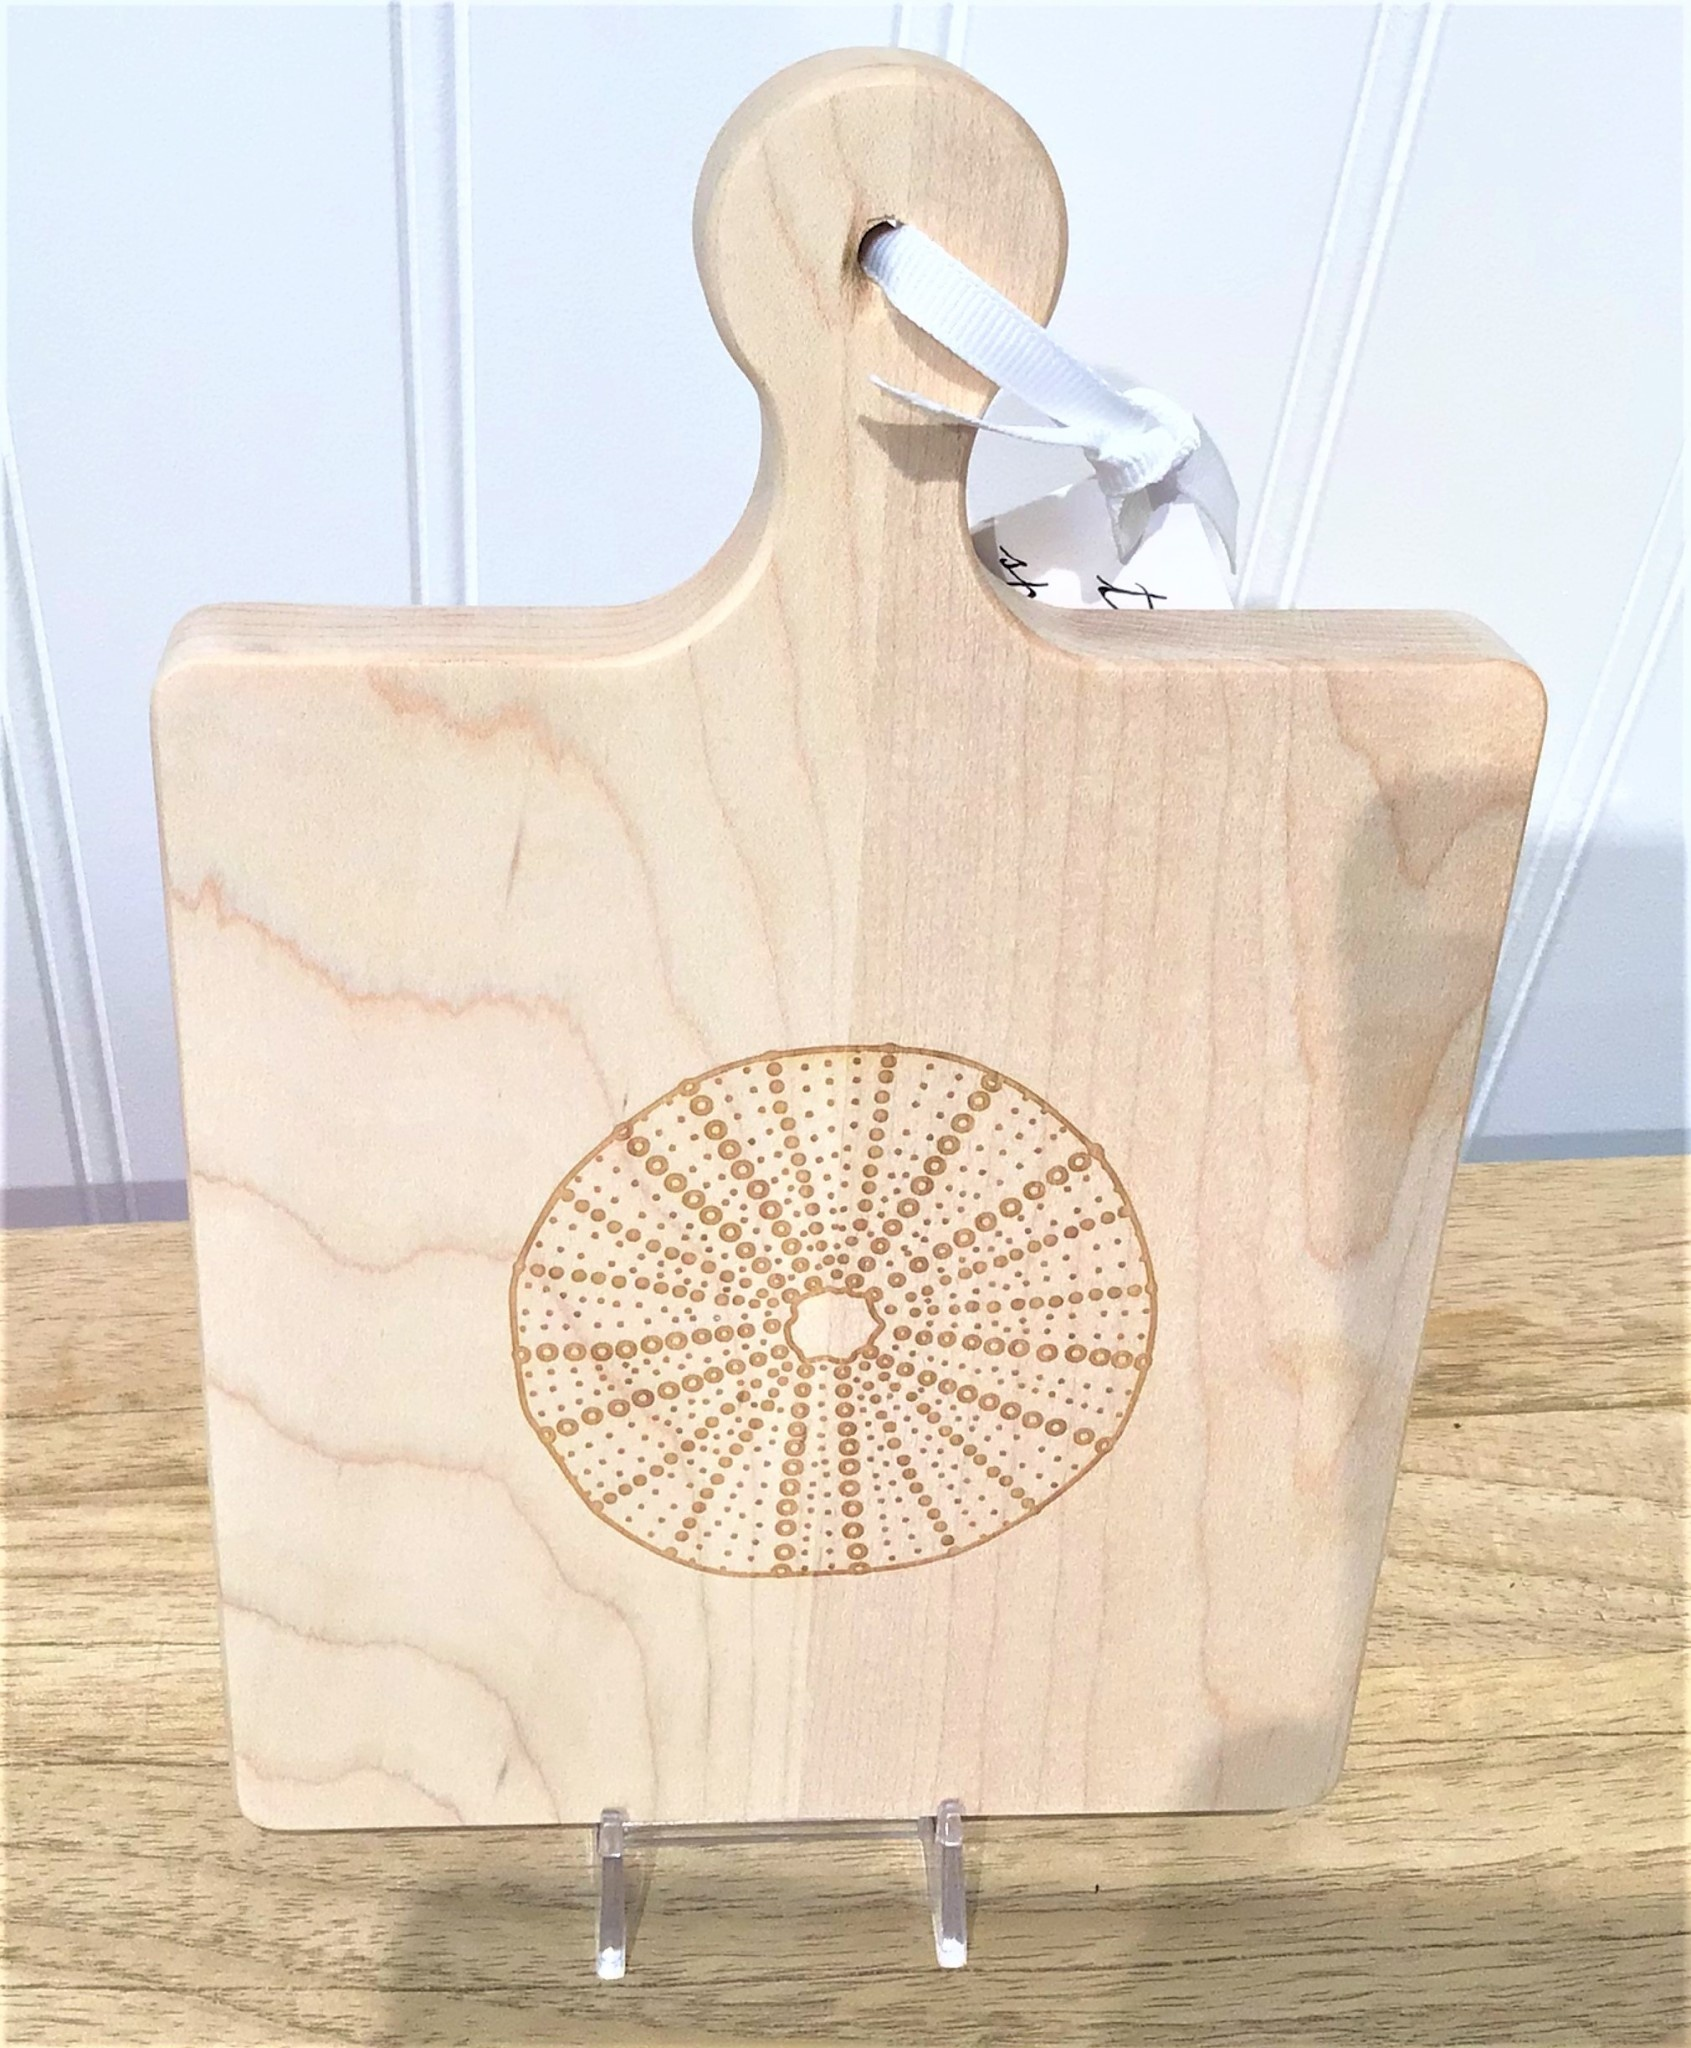 Sand Dollar 9x6 Maple Artisan Board